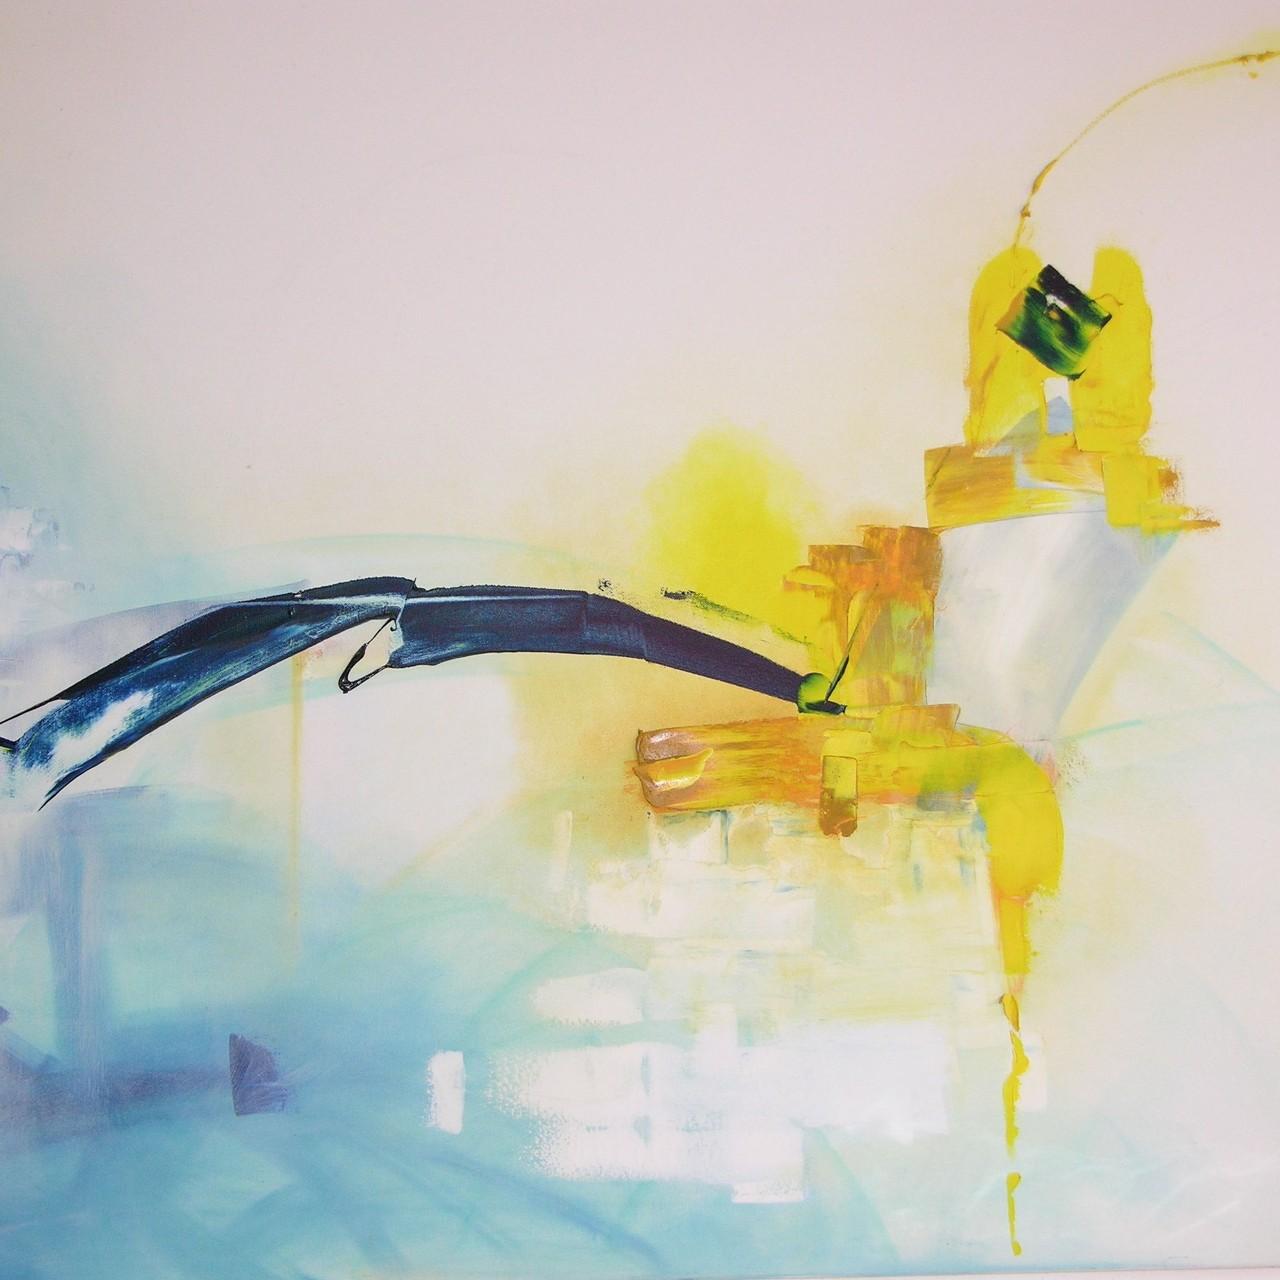 Aufbruch, Öl auf Leinwand, 150 x 100 cm